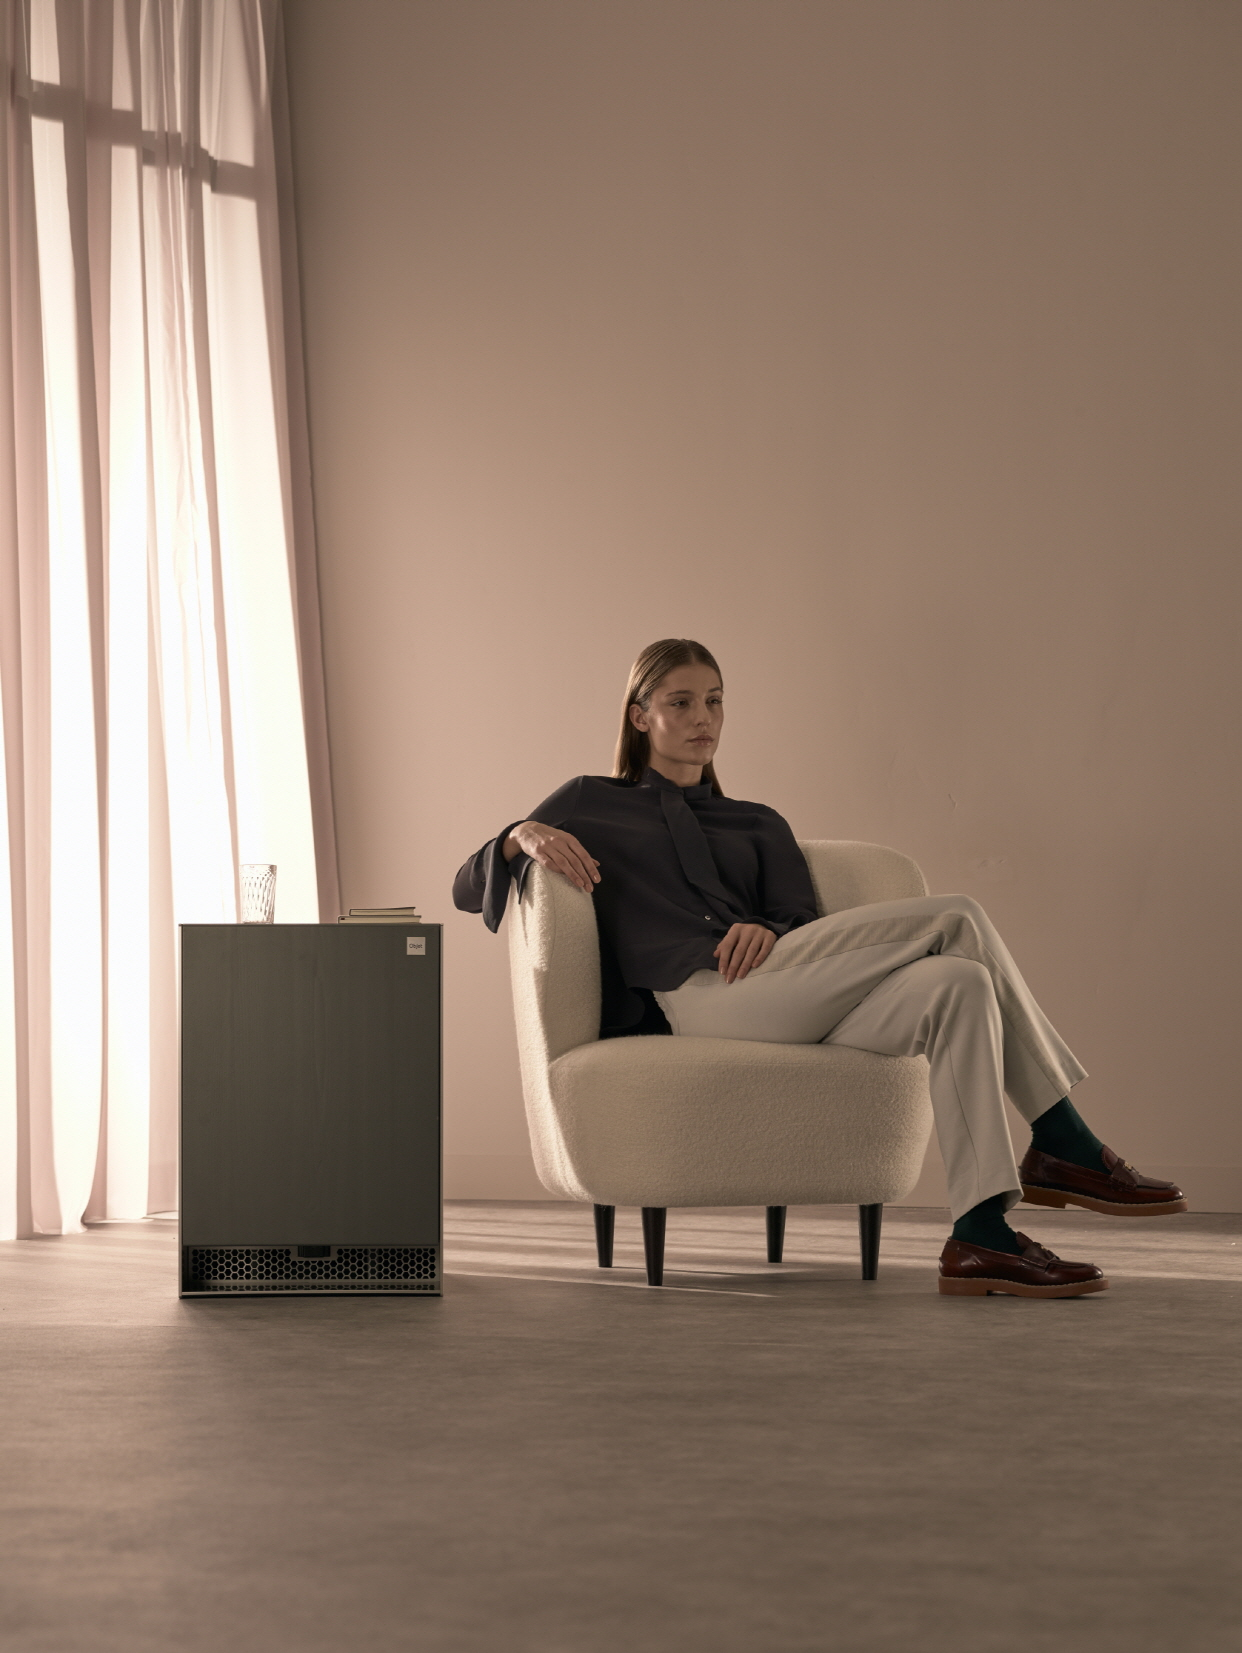 'LG 오브제(LG Objet)'는 나만의 공간과 시간을 완성시켜주는 프리미엄 프라이빗 가전(Premium Private Appliance)이다. 가전(家電)과 가구(家具)를 결합한 신개념 융복합 가전으로 인테리어와 조화를 이루는 차별화된 디자인으로 더욱 아름다운 공간을 연출할 수 있다. 사진은 LG 오브제 4가지 제품 중 냉장고.